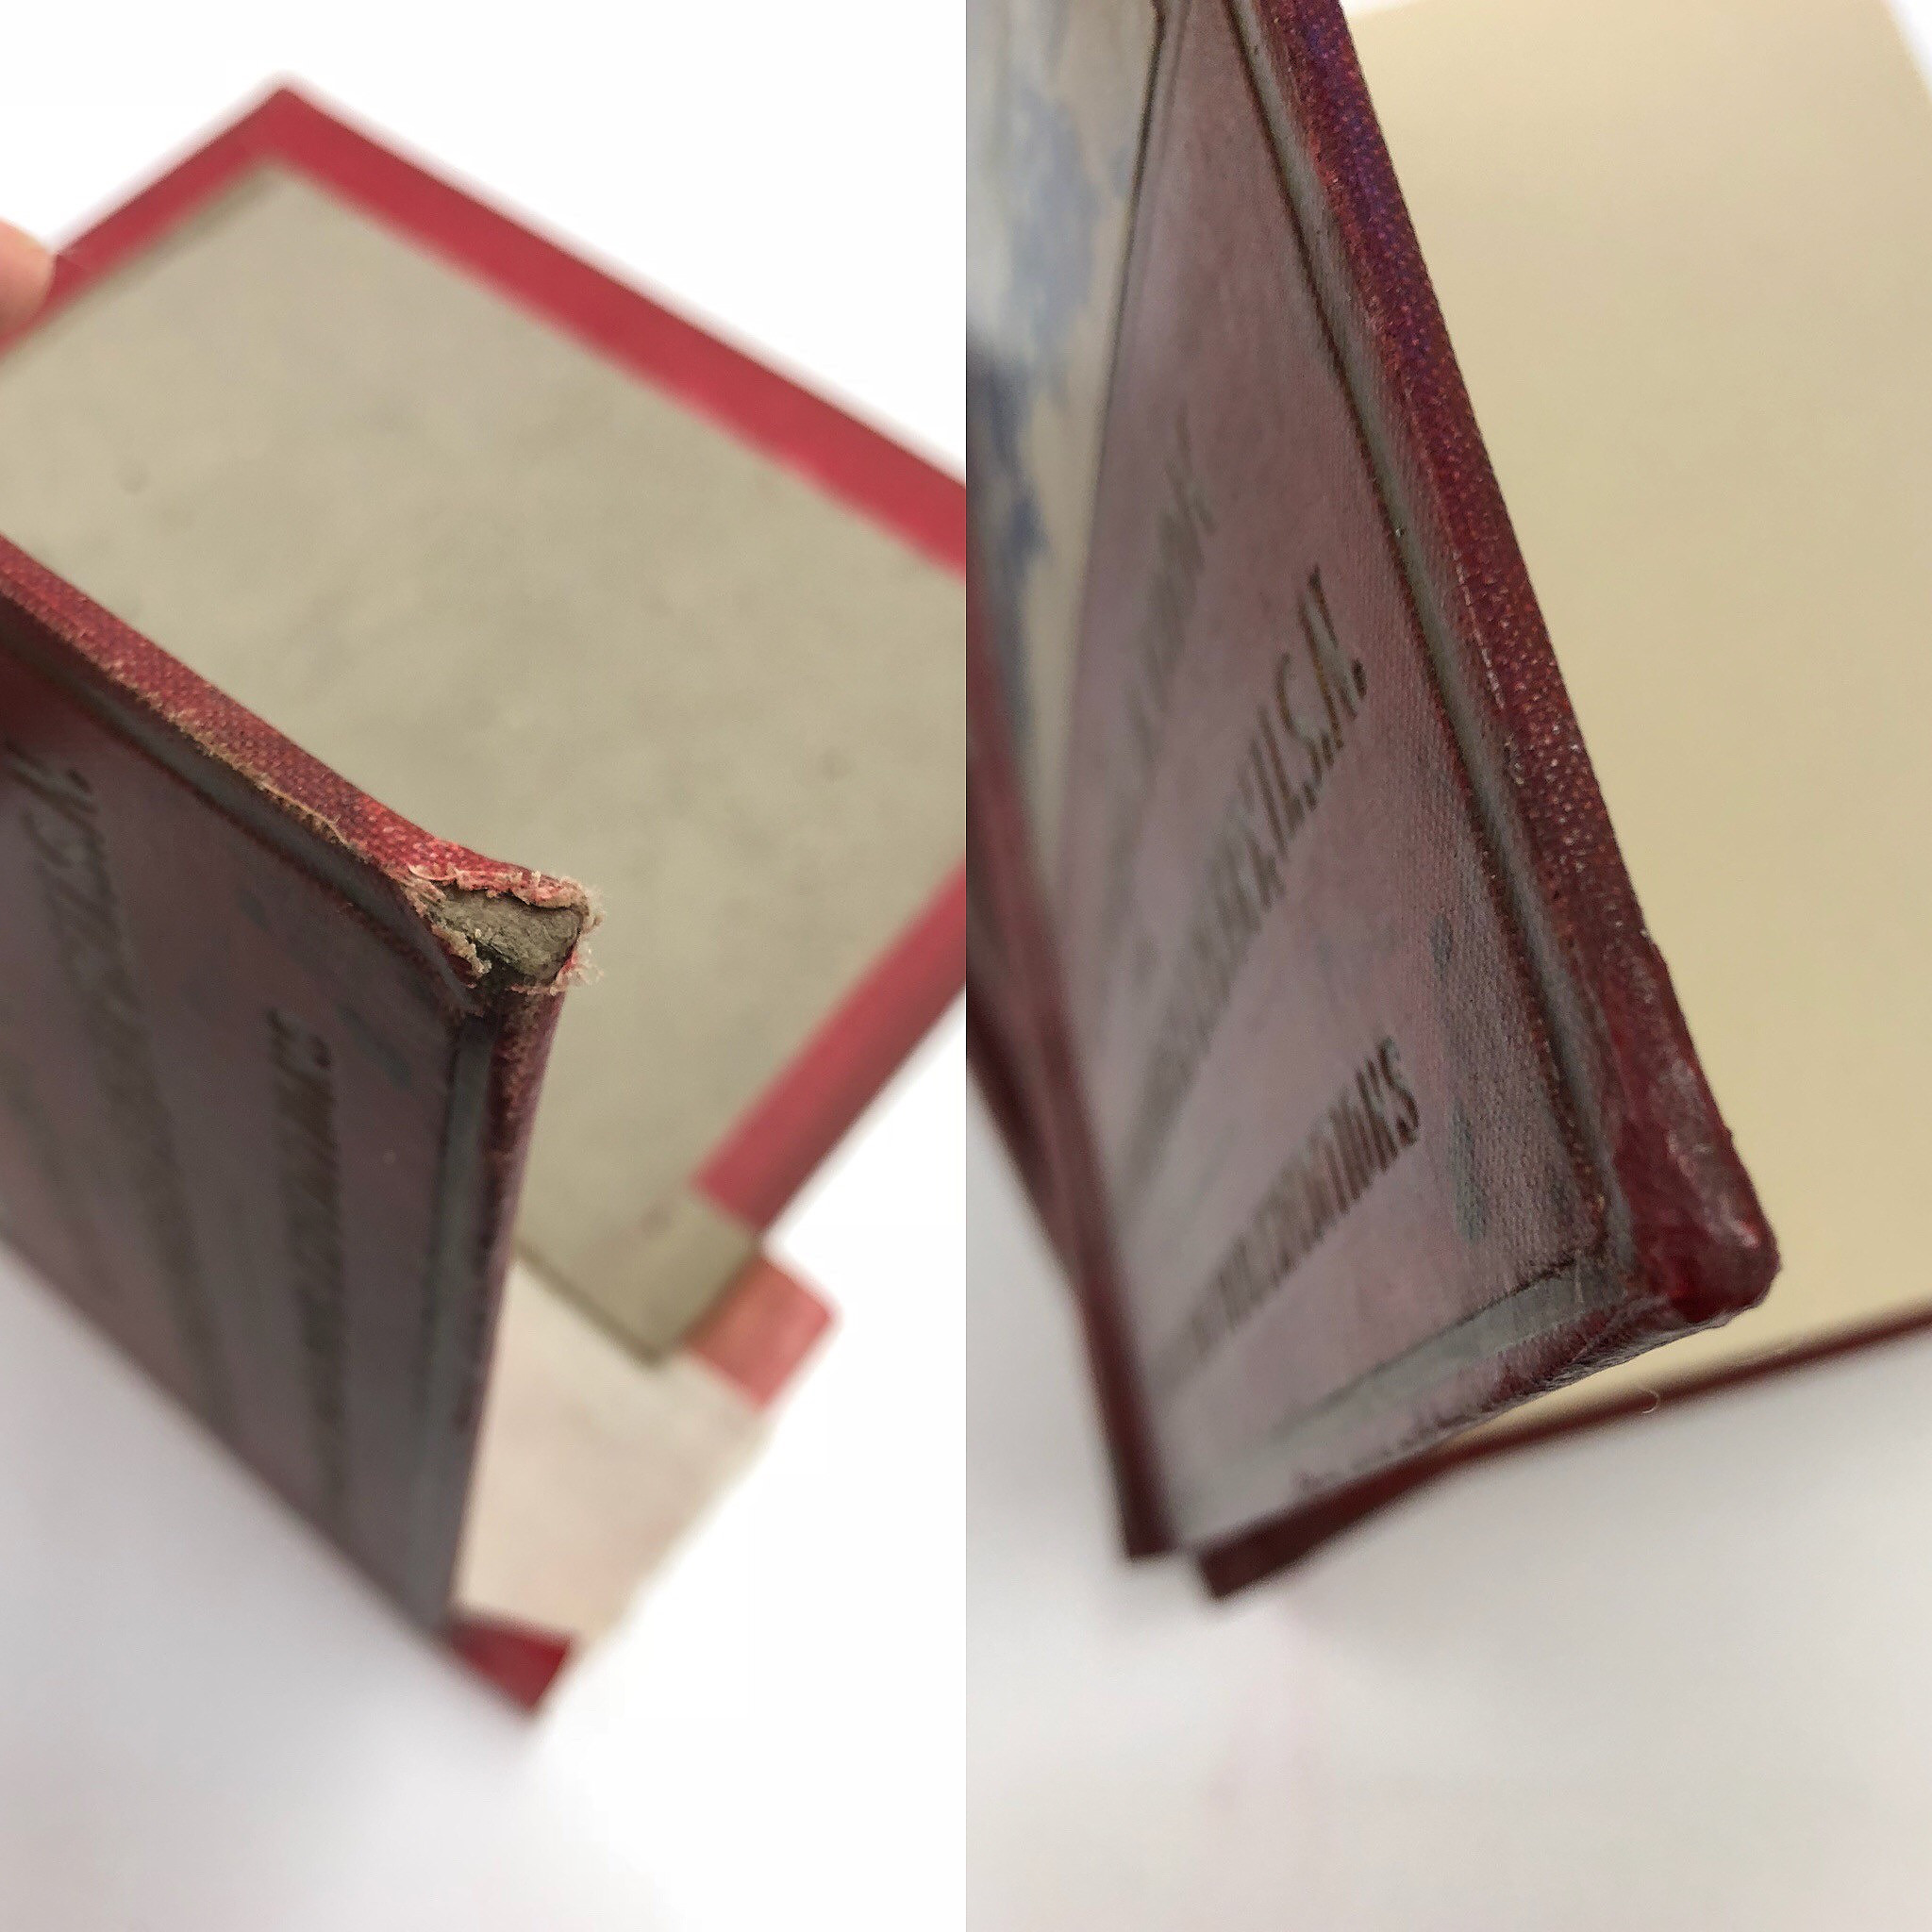 Before Treatment (Detail of damaged corner) After Treatment (Detail of repaired corner)